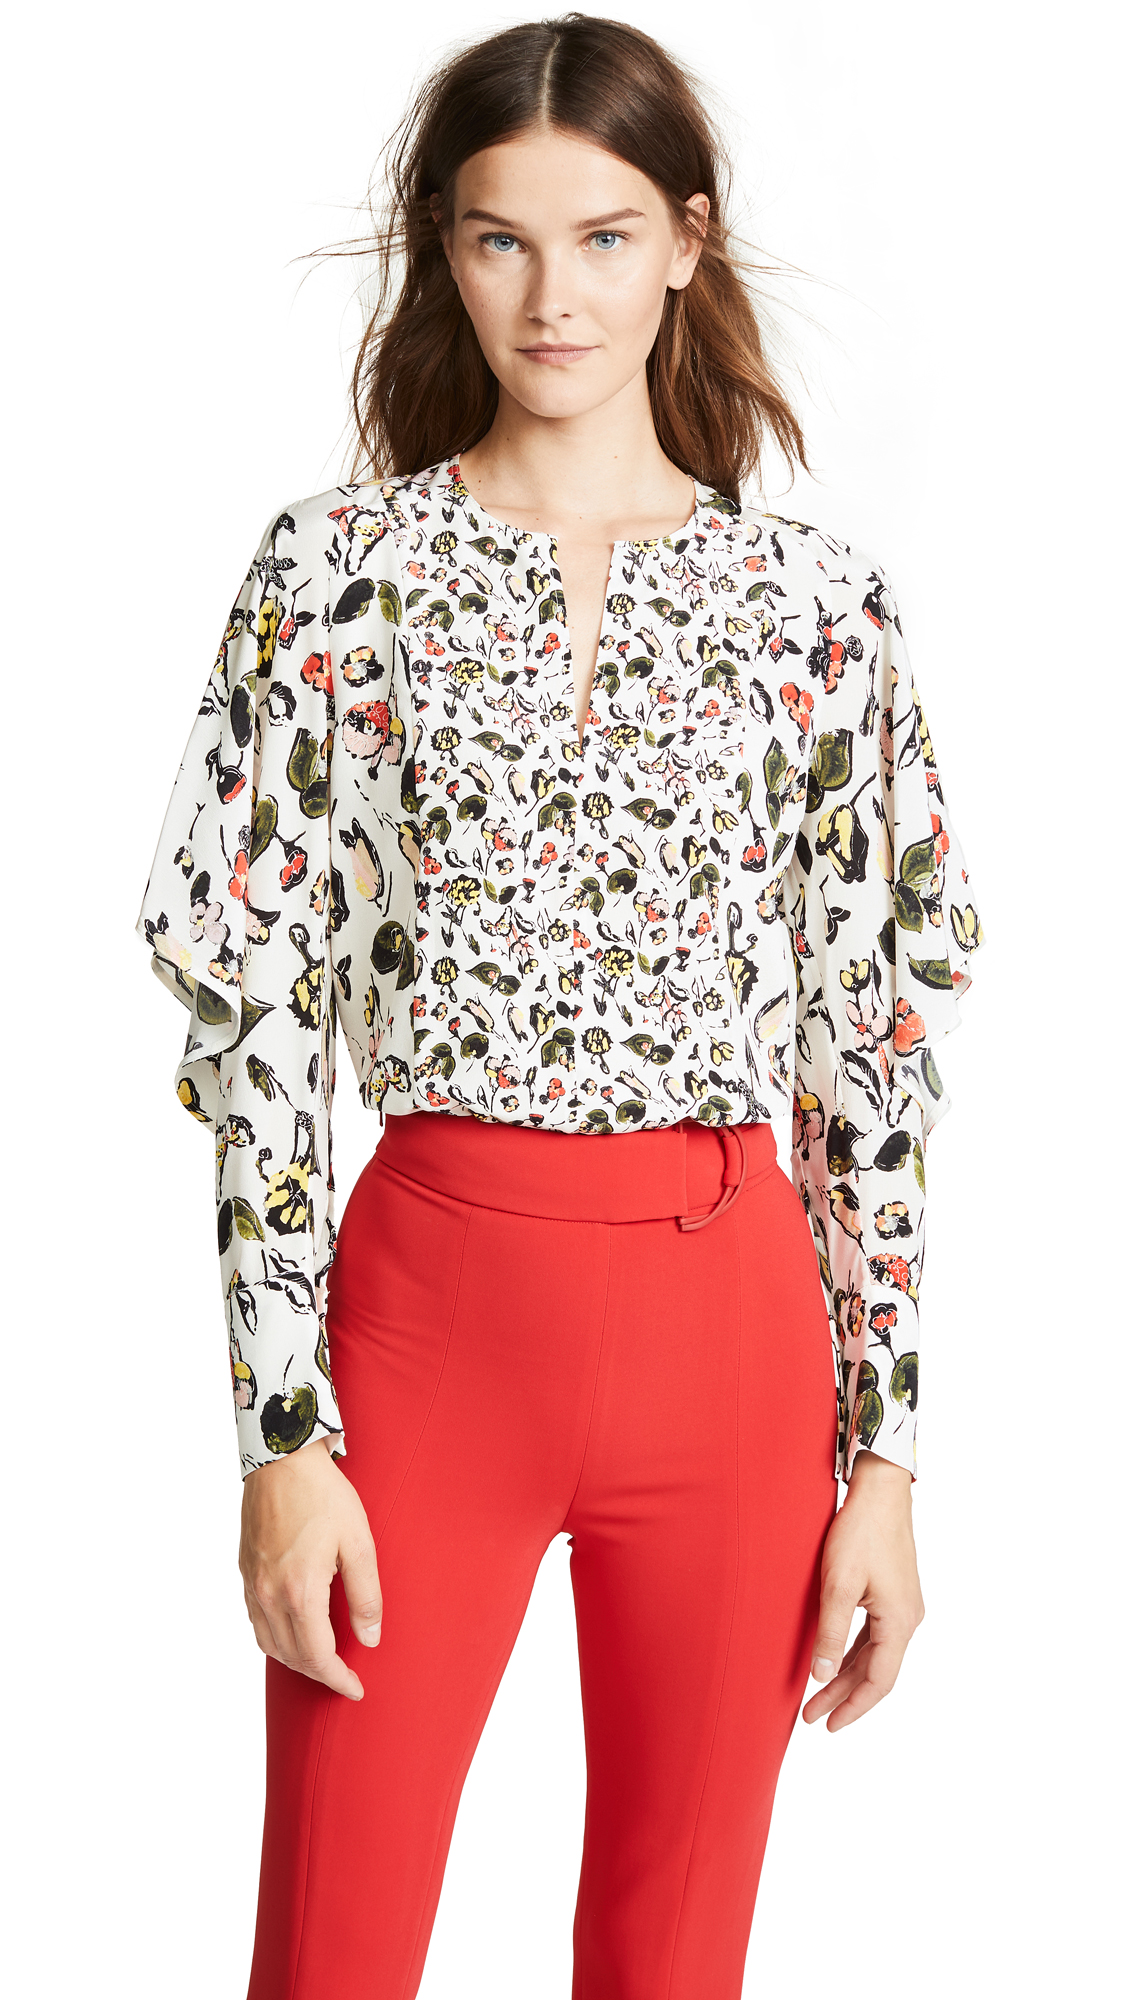 JASON WU GREY Ruffled Floral-Print Silk Crepe De Chine Shirt in Beige Multi